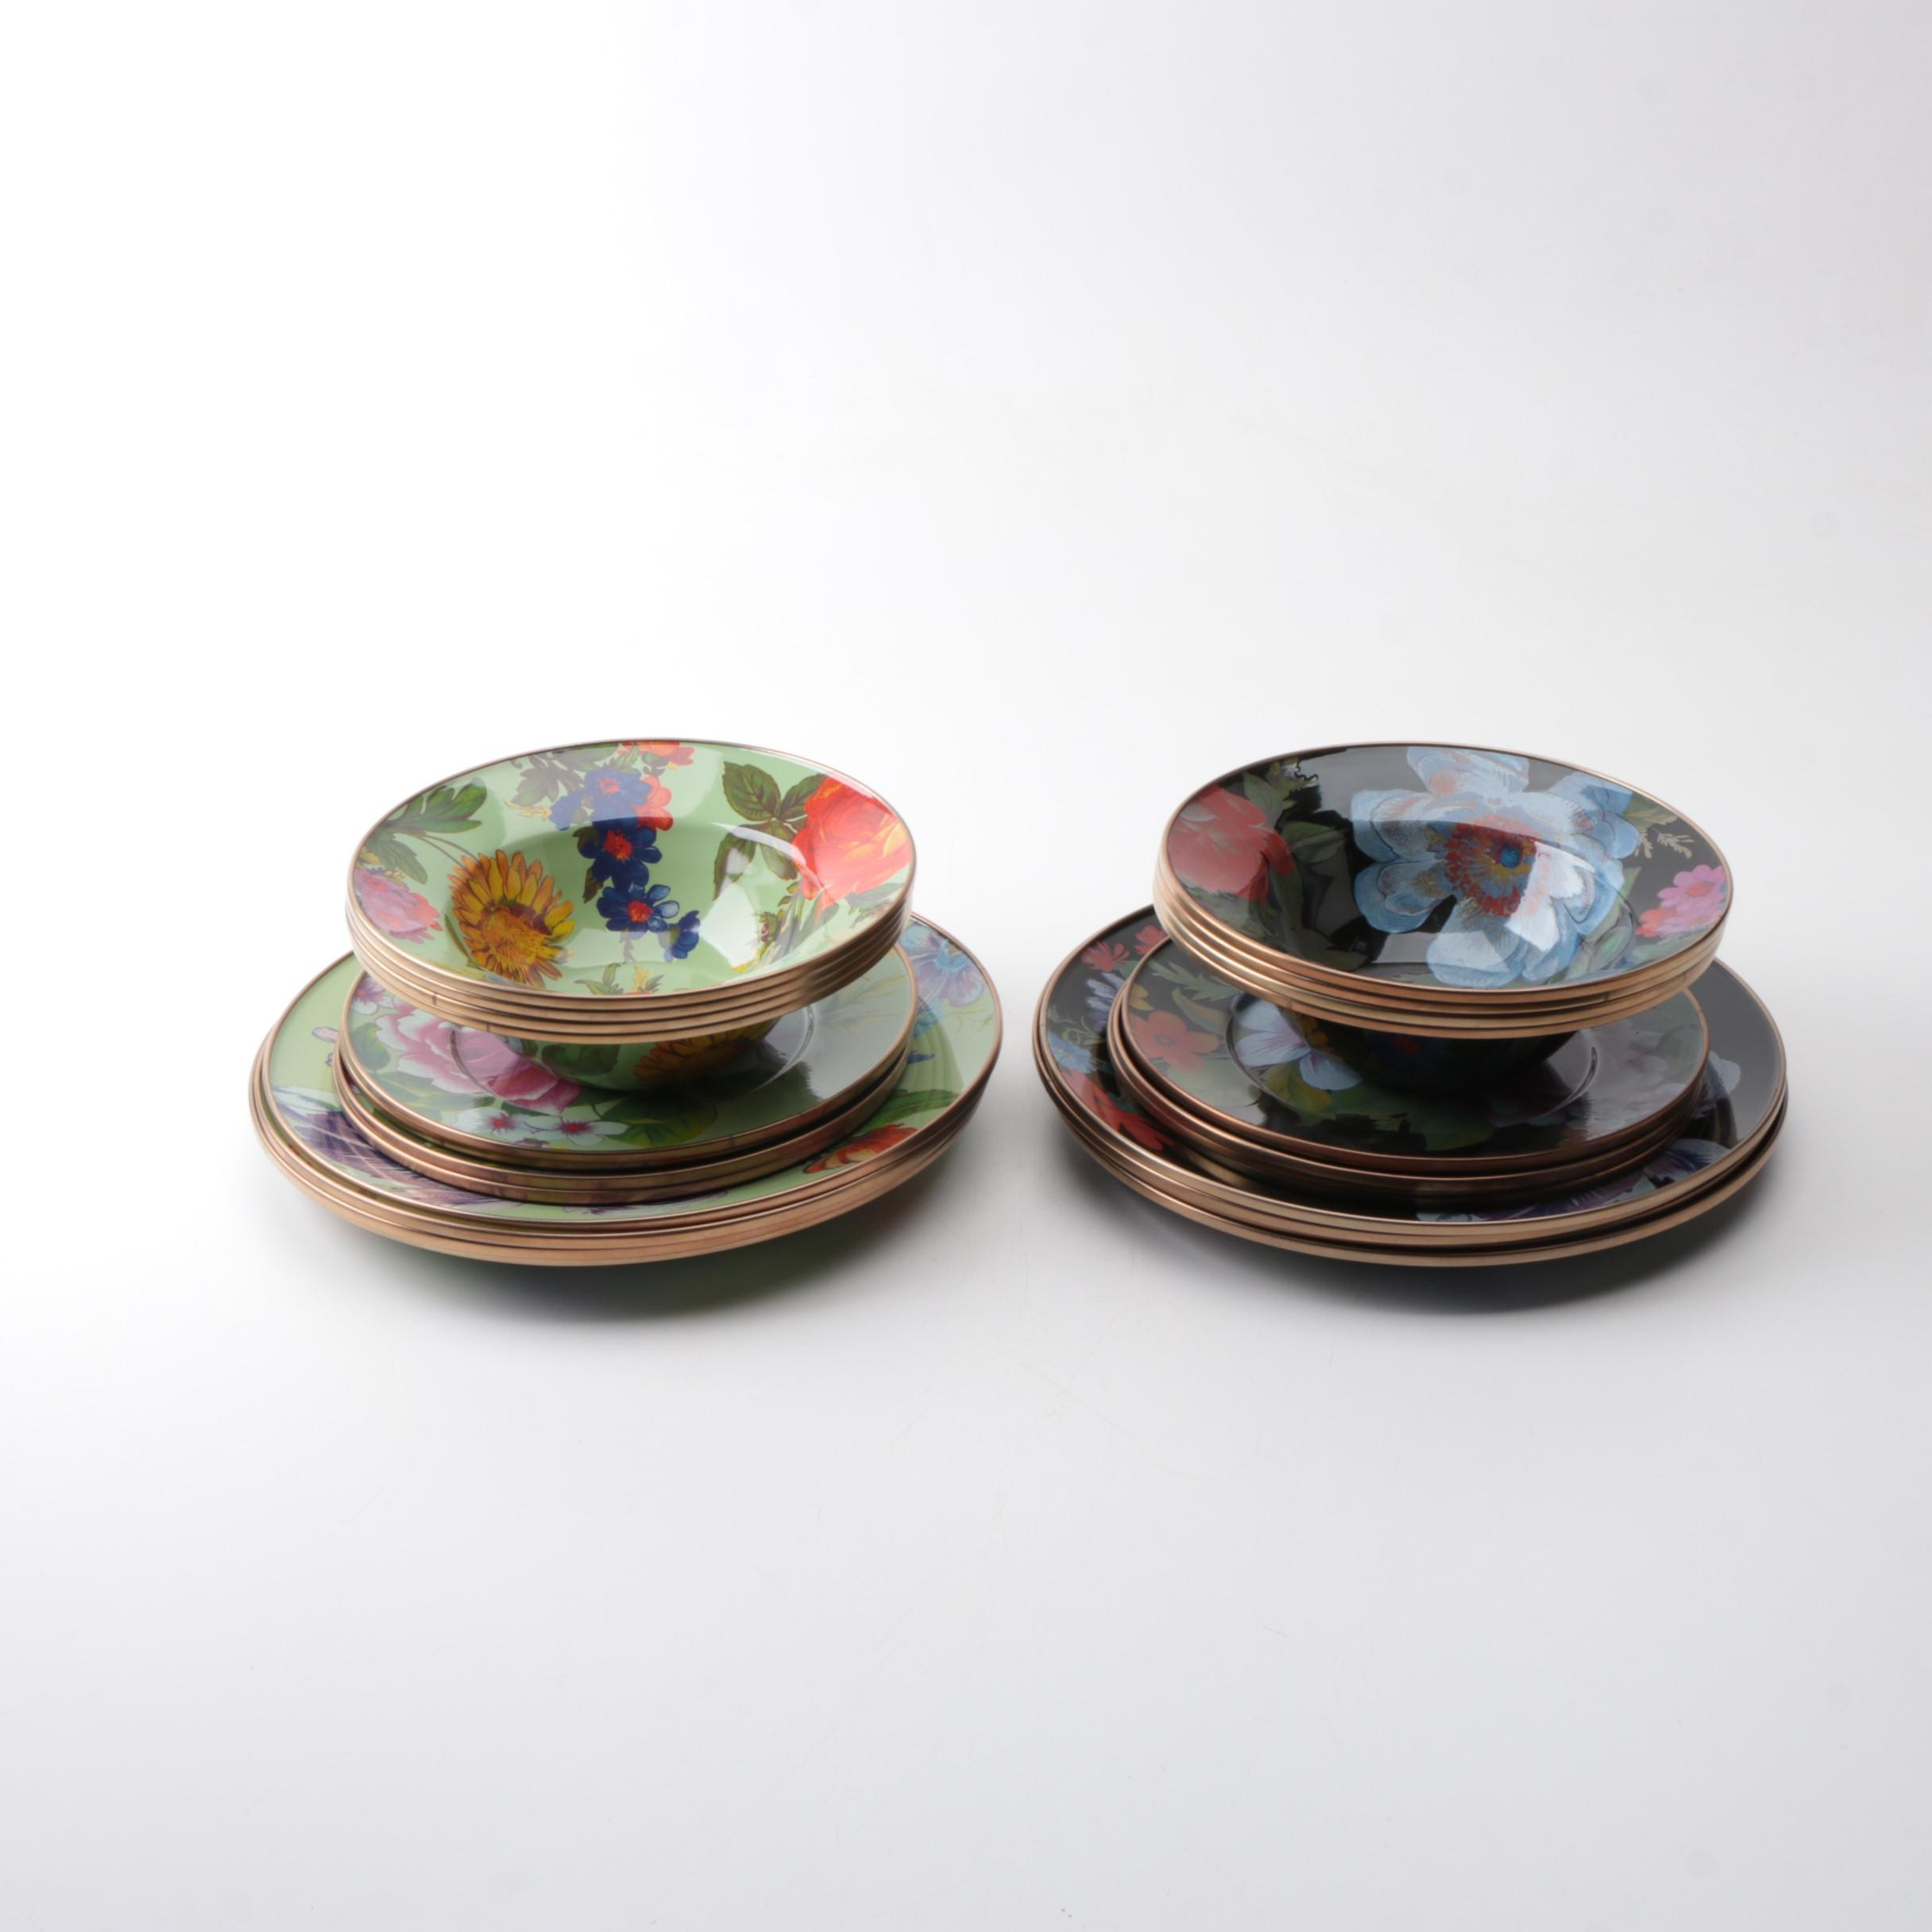 "MacKenzie Childs ""Flower Market"" Plates and Bowls"